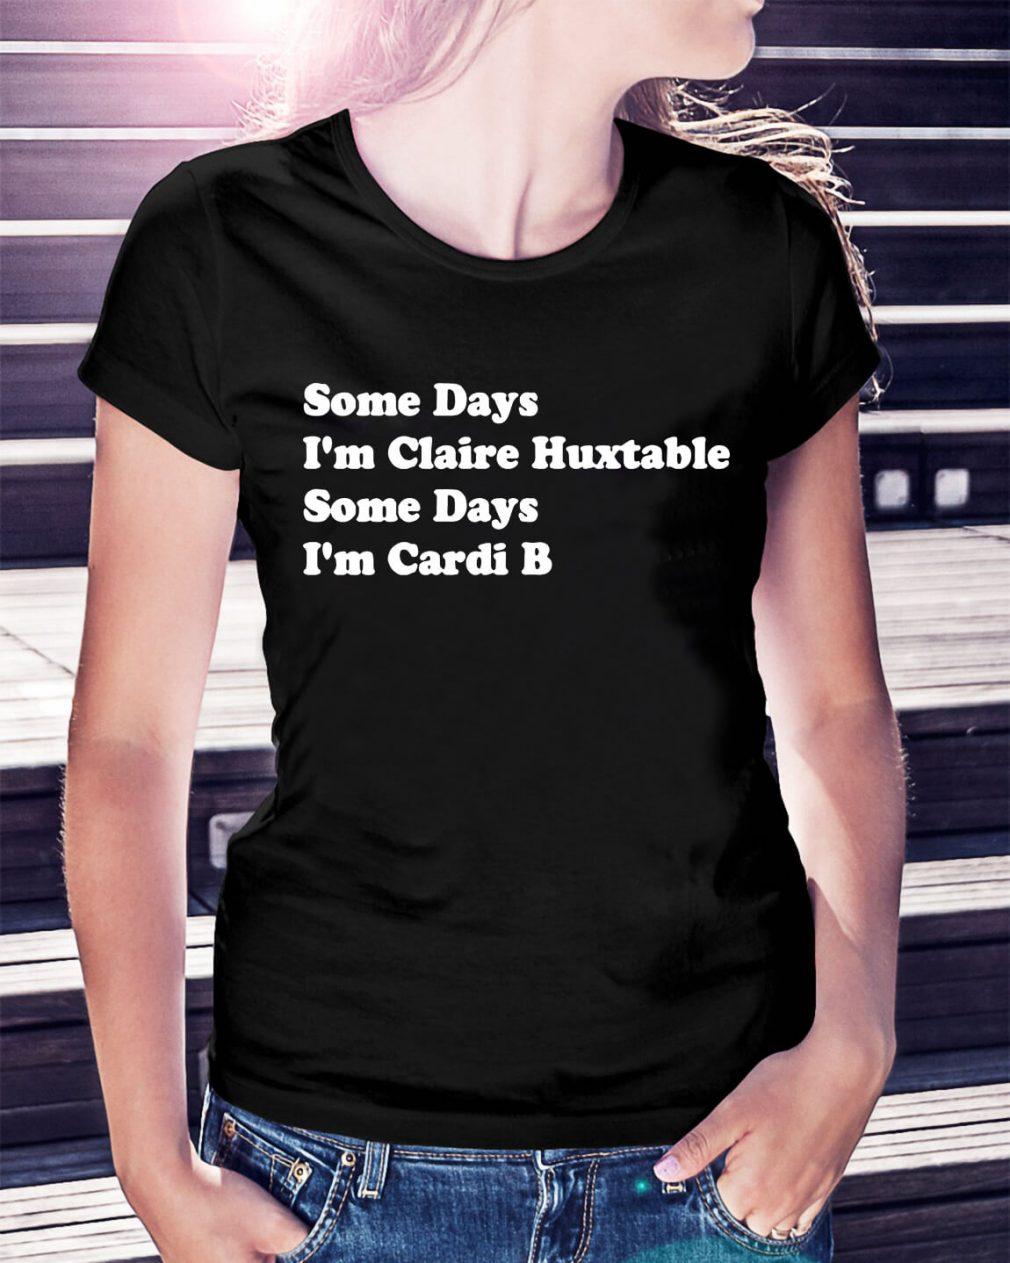 Some days I'm Claire Huxtable some days I'm Cardi B shirt